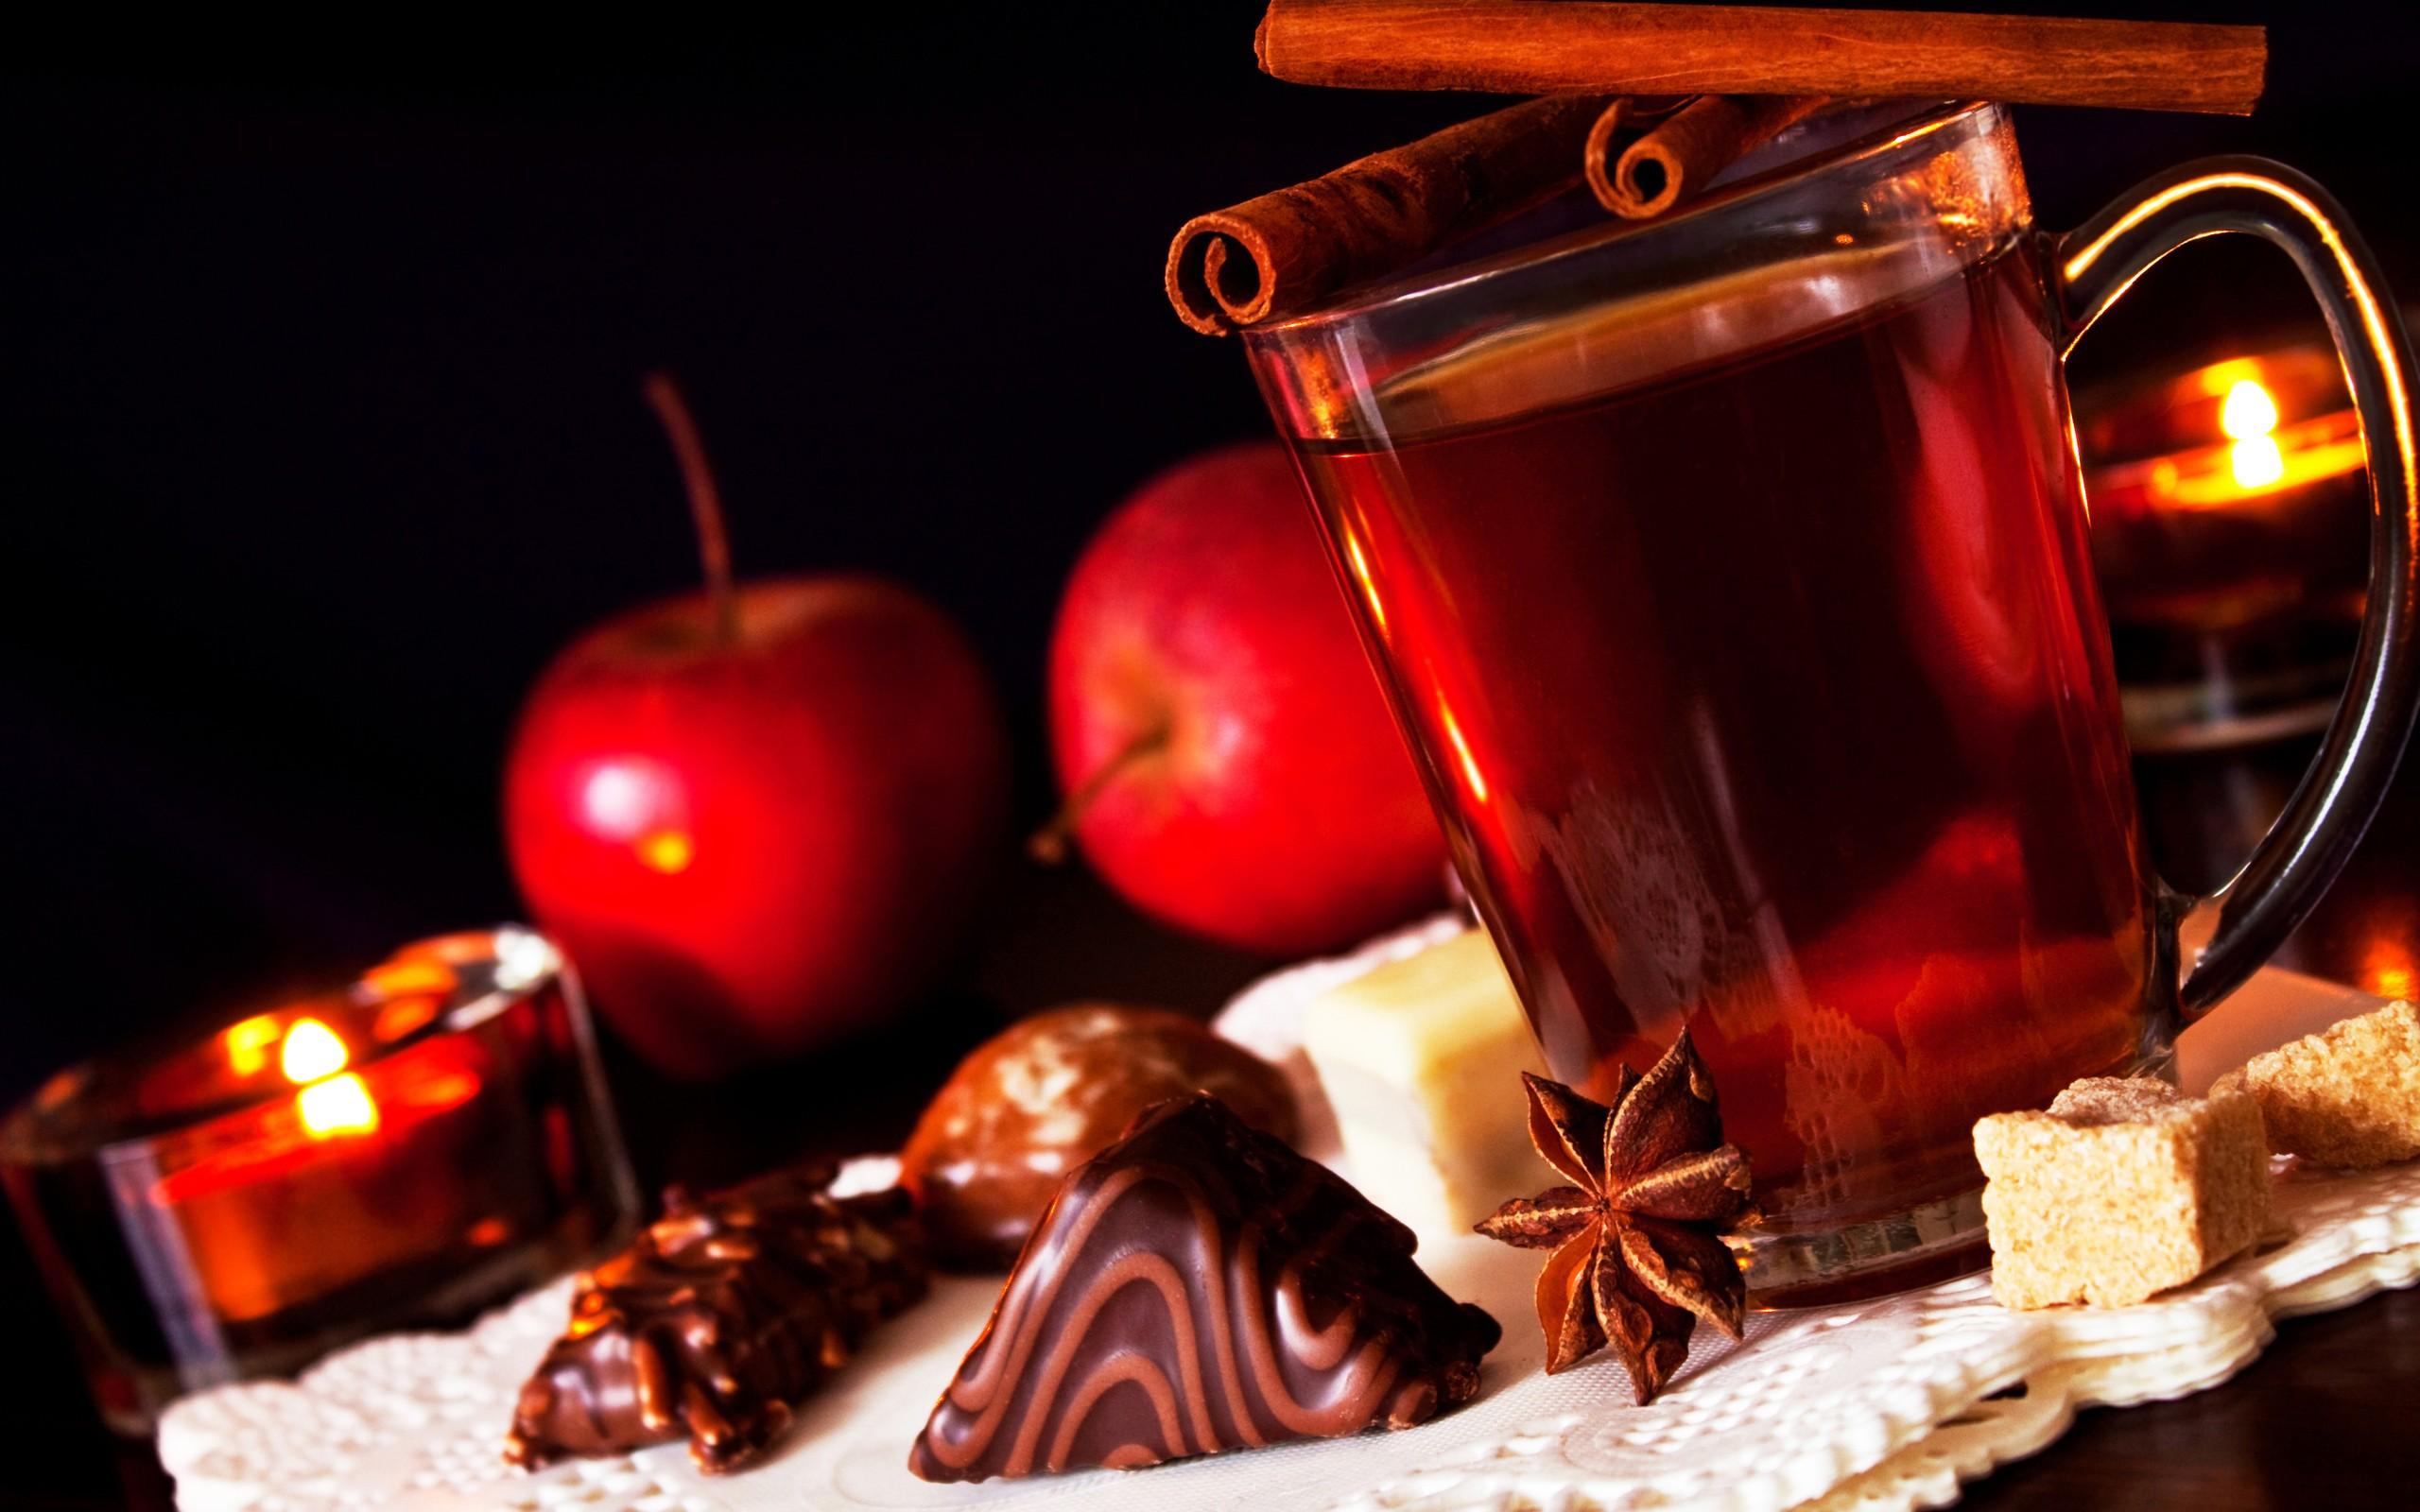 http://www.zastavki.com/pictures/originals/2013/Food___Drinks_Tea_with_cinnamon_and_sweets_036974_.jpg